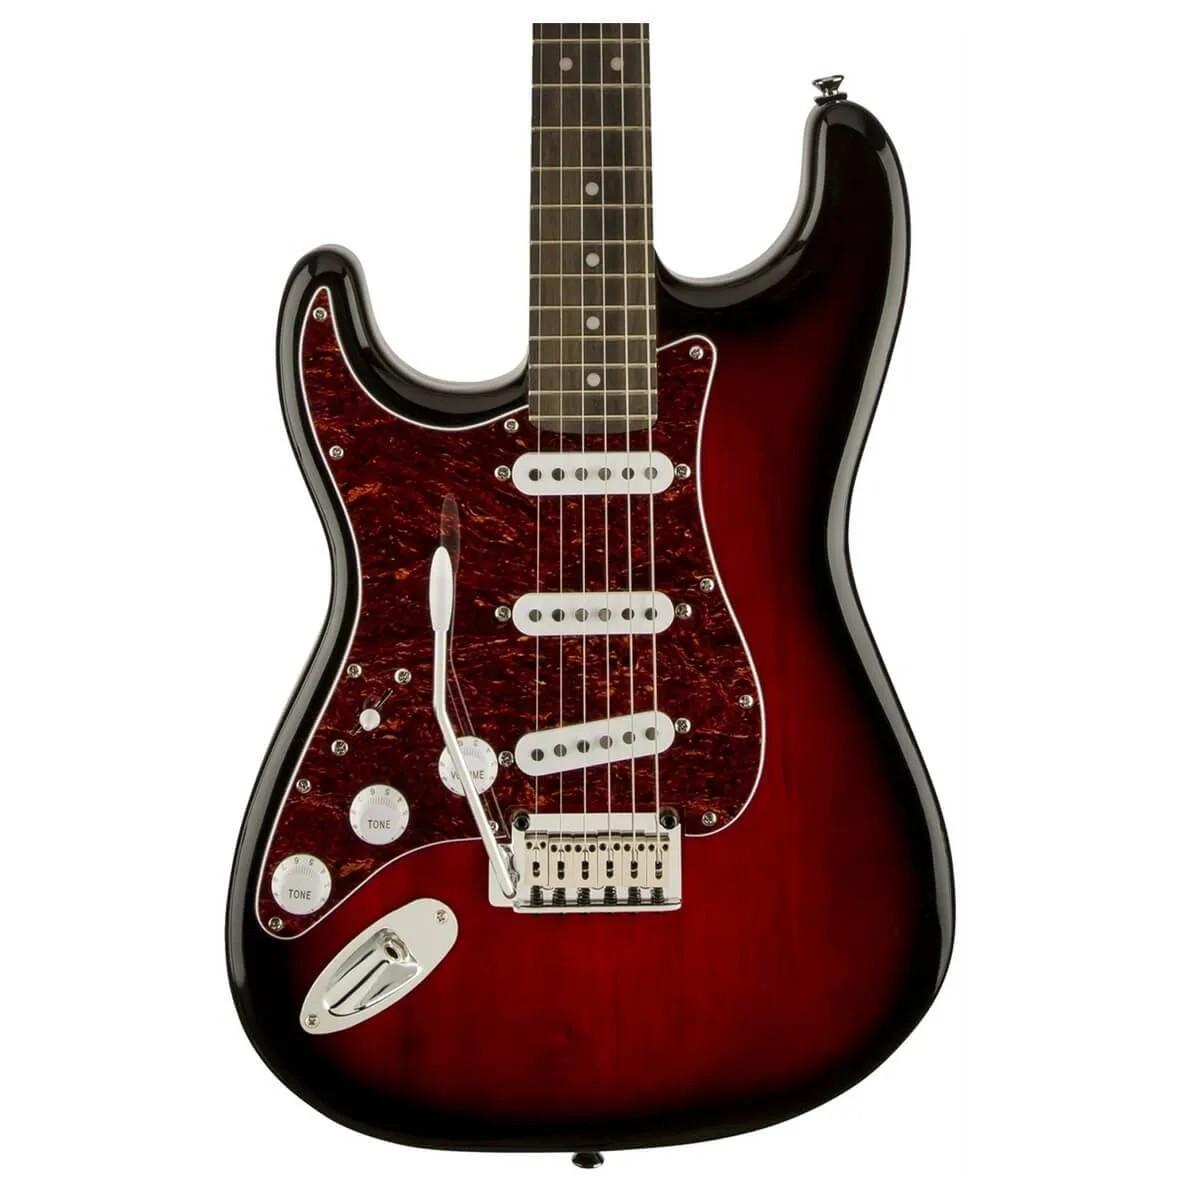 Guitarra Fender Squier Standard Strato Canhoto Antique Burst